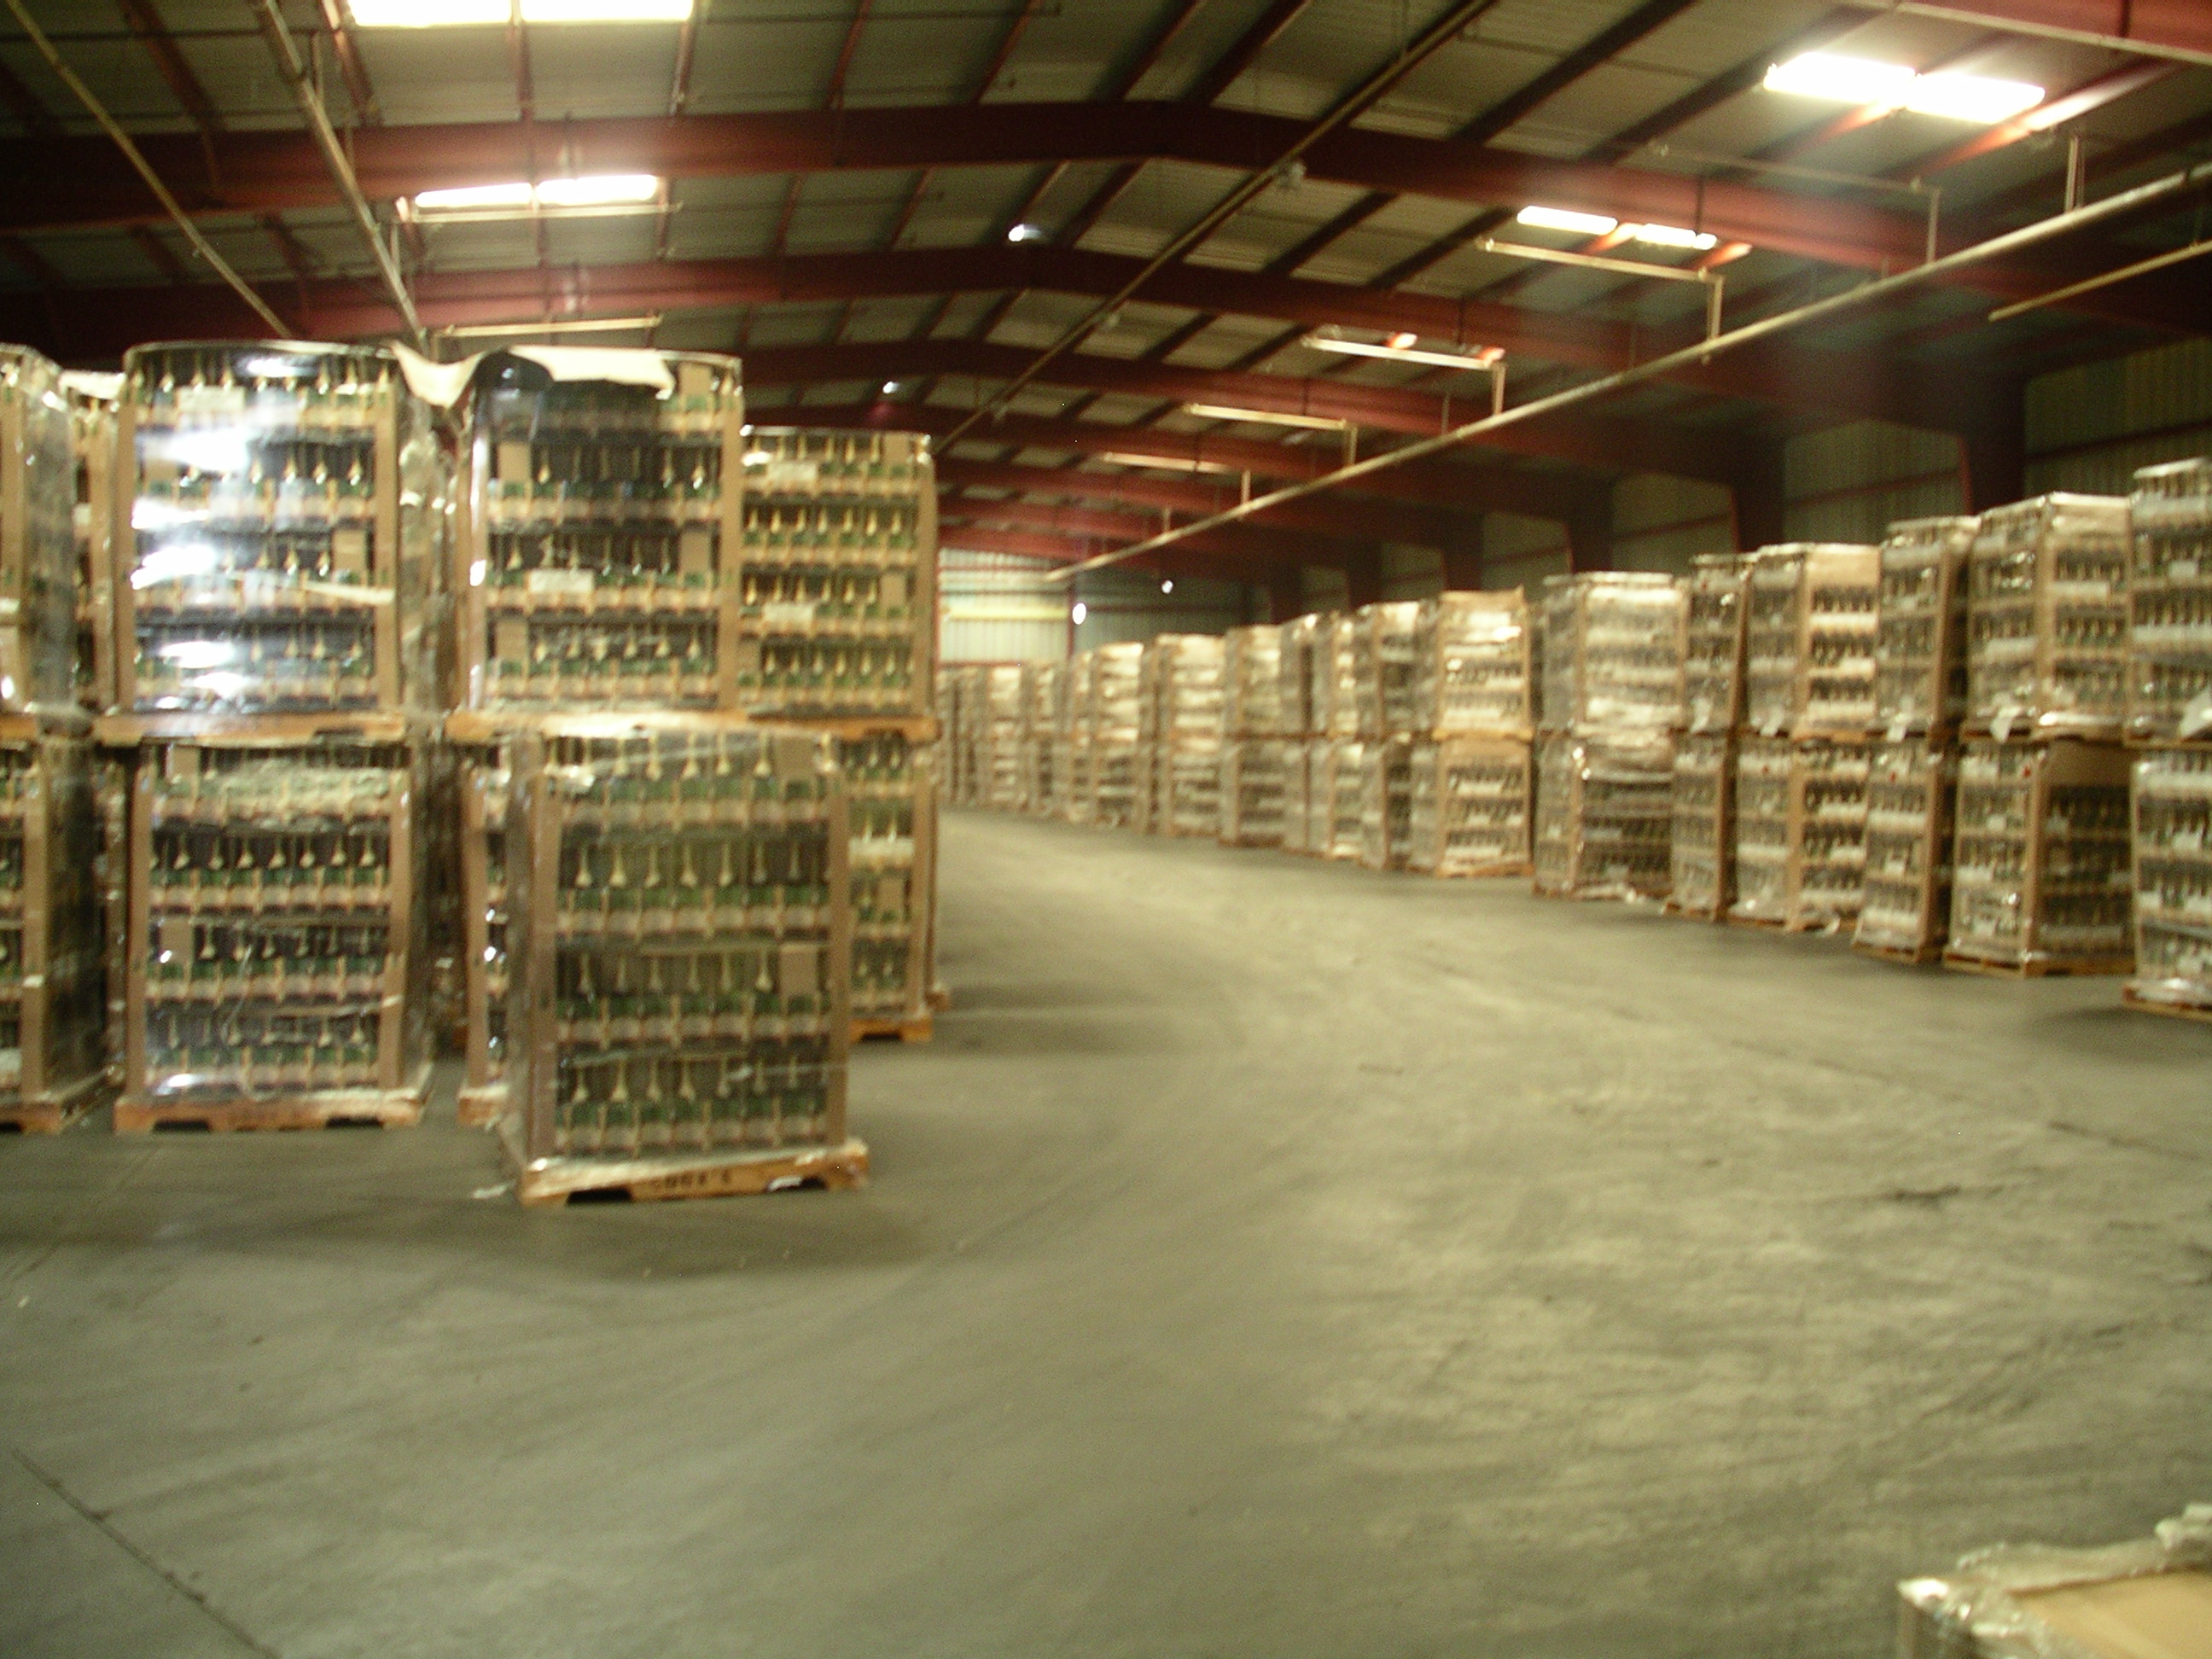 Warehouse clipart storage warehouse Distribution storage and warehouse